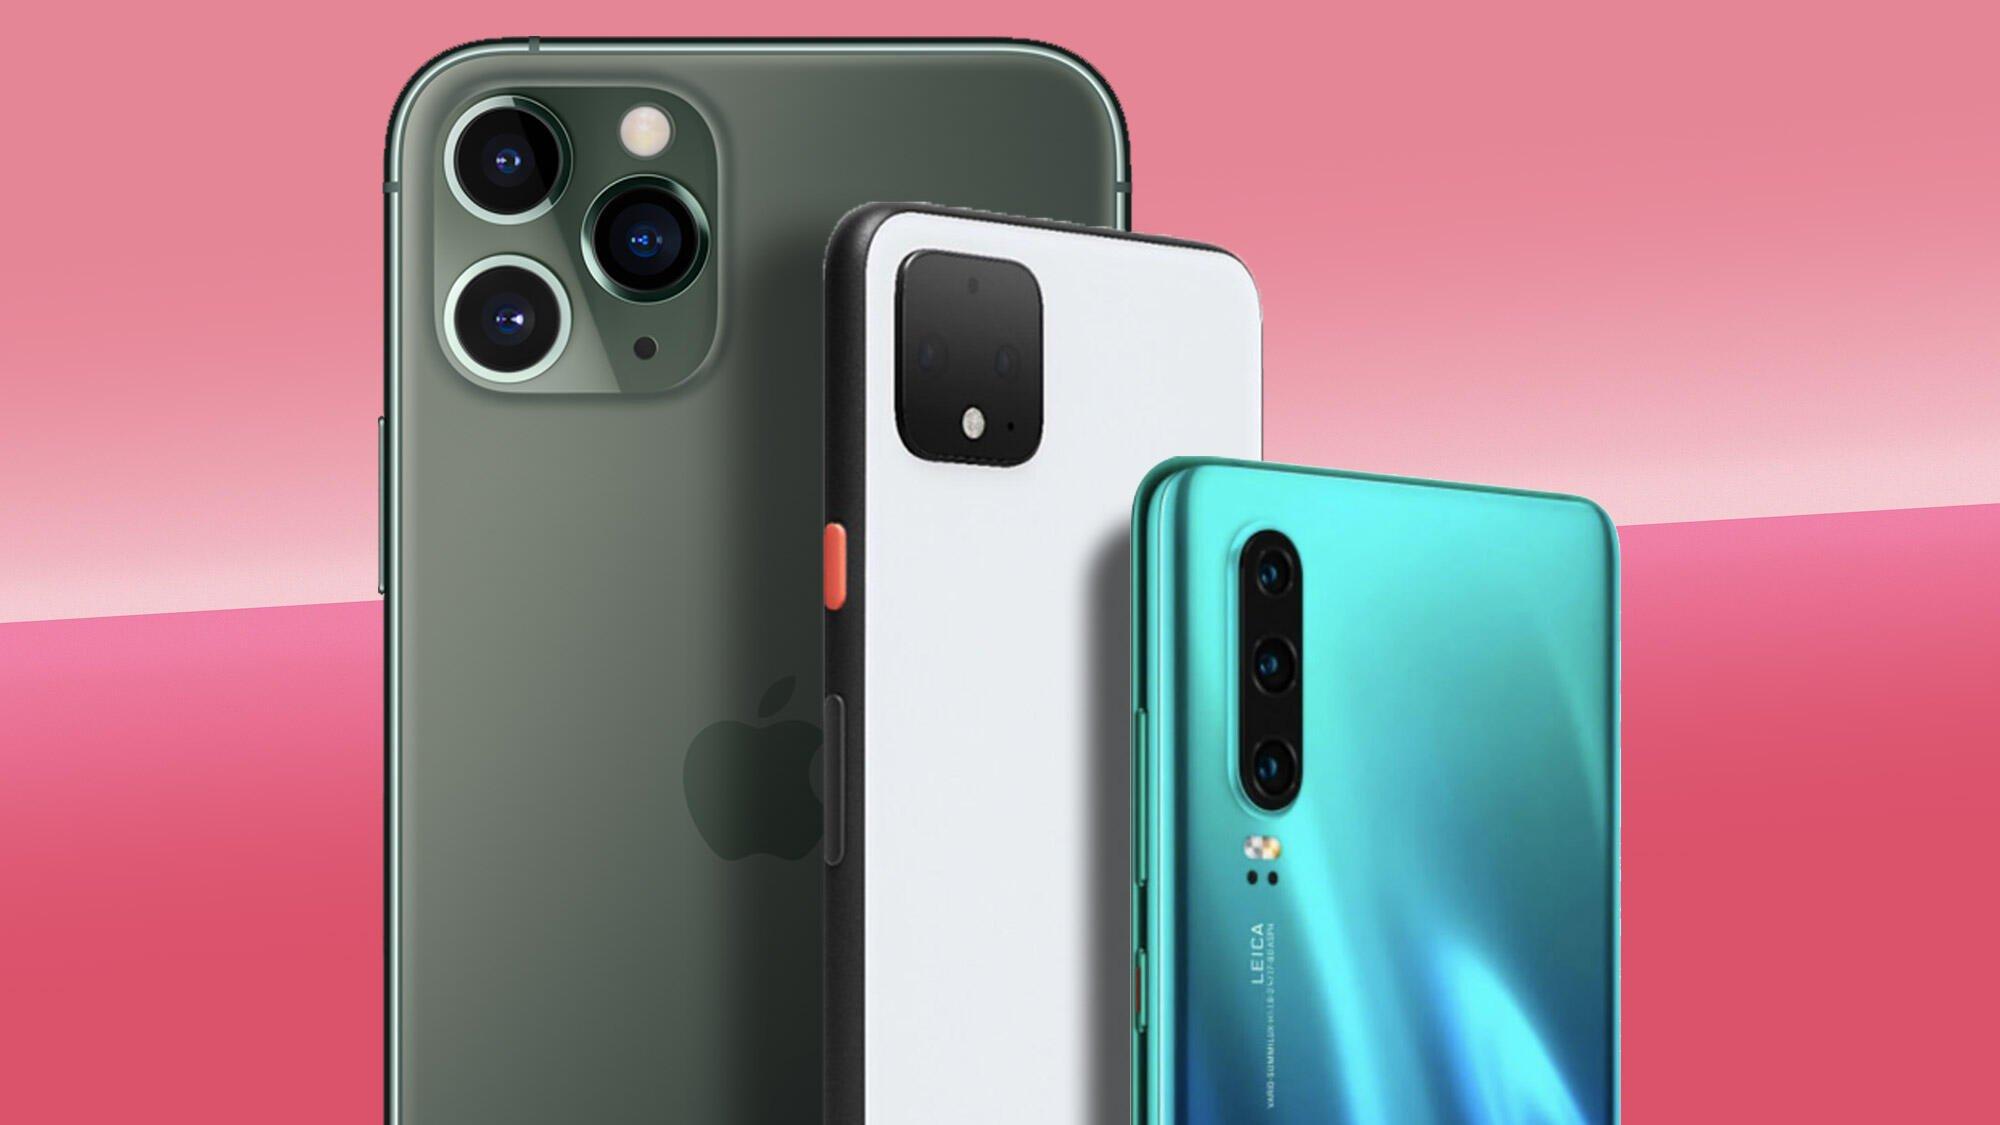 En çok satan Android telefon